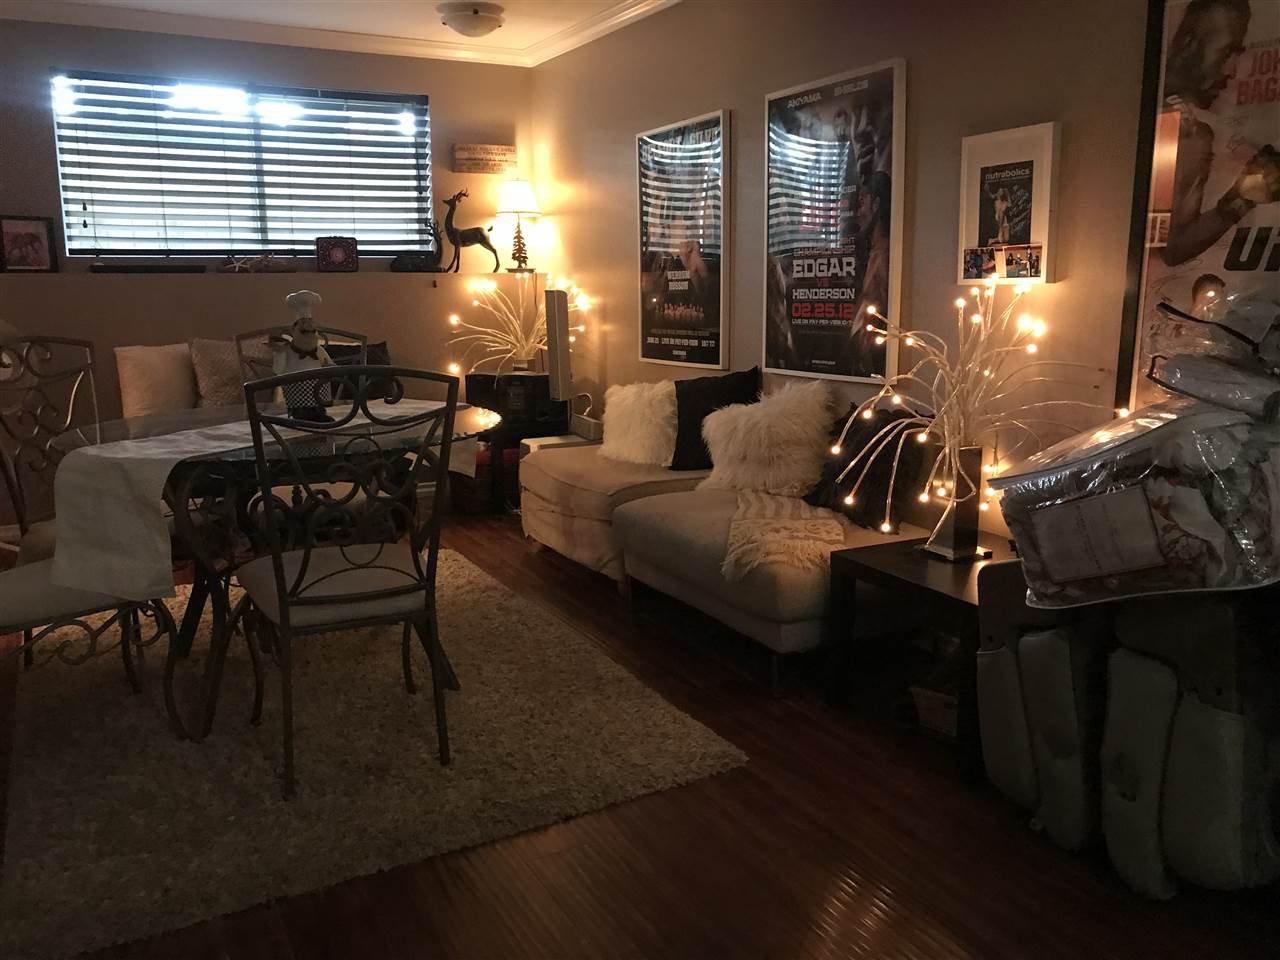 Main Photo: 24346 102B Avenue in Maple Ridge: Albion House for sale : MLS®# R2405429